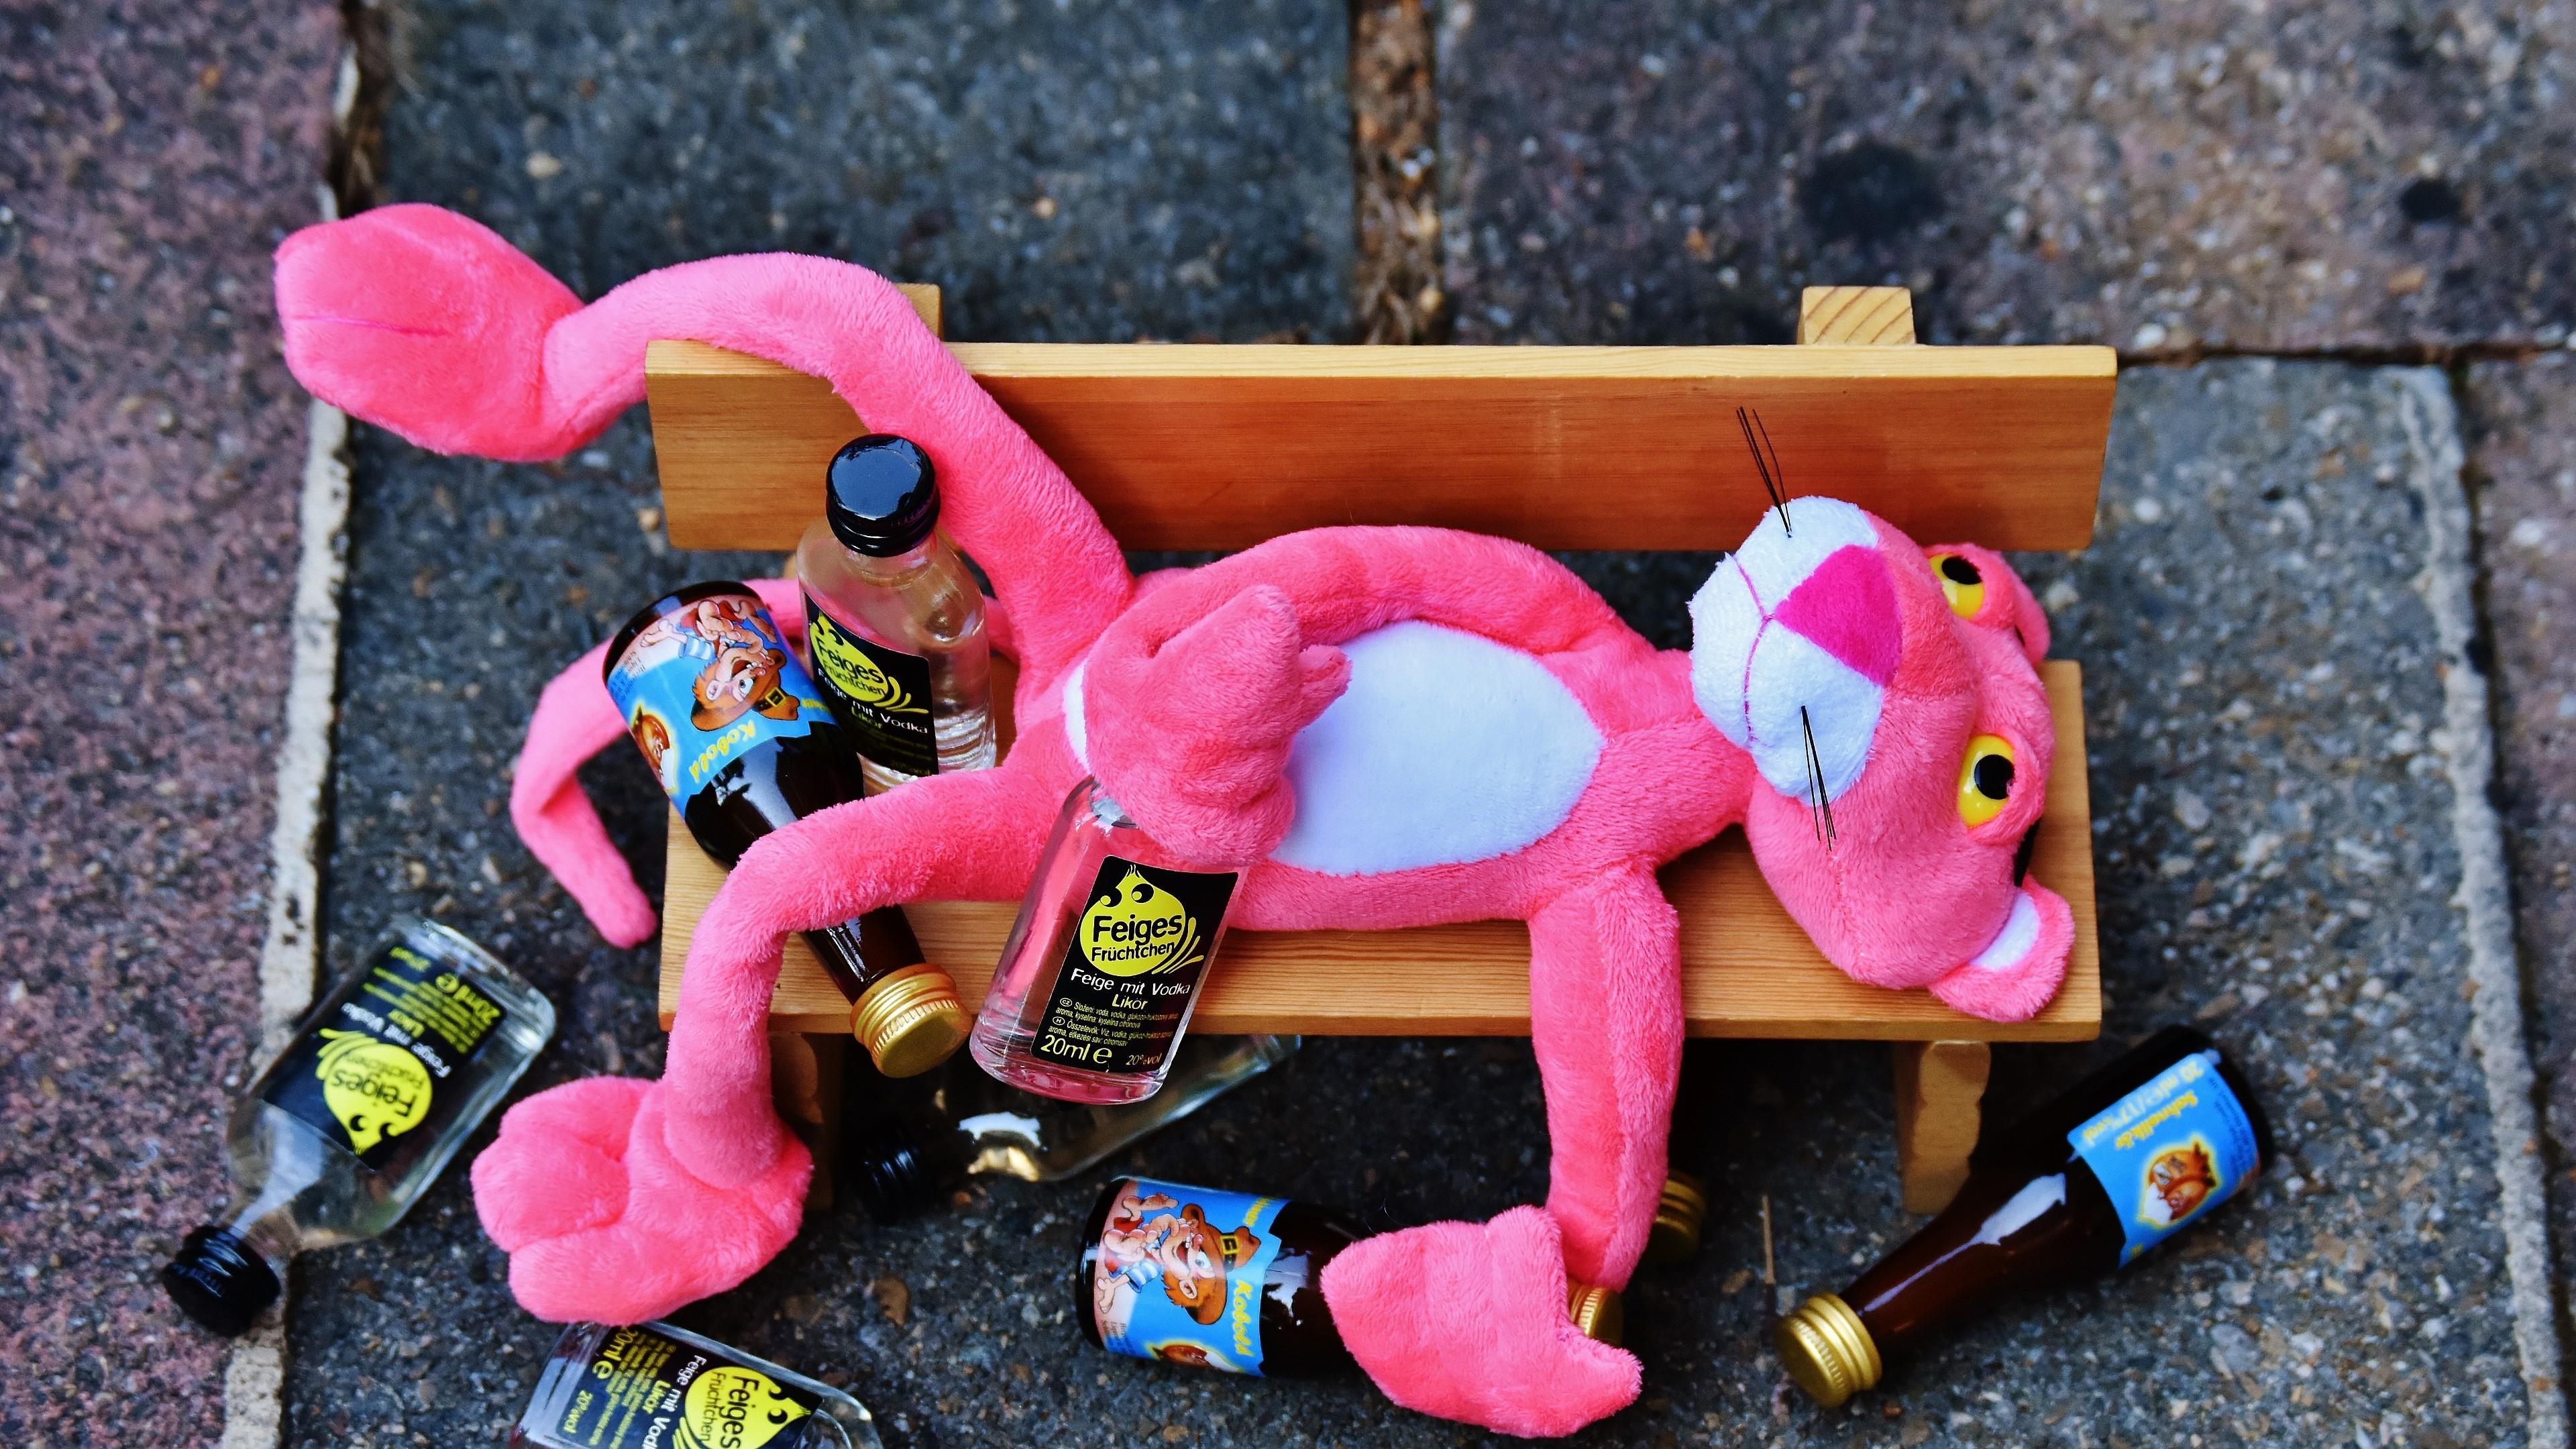 Drunken Pink Panther on a bench wallpaper